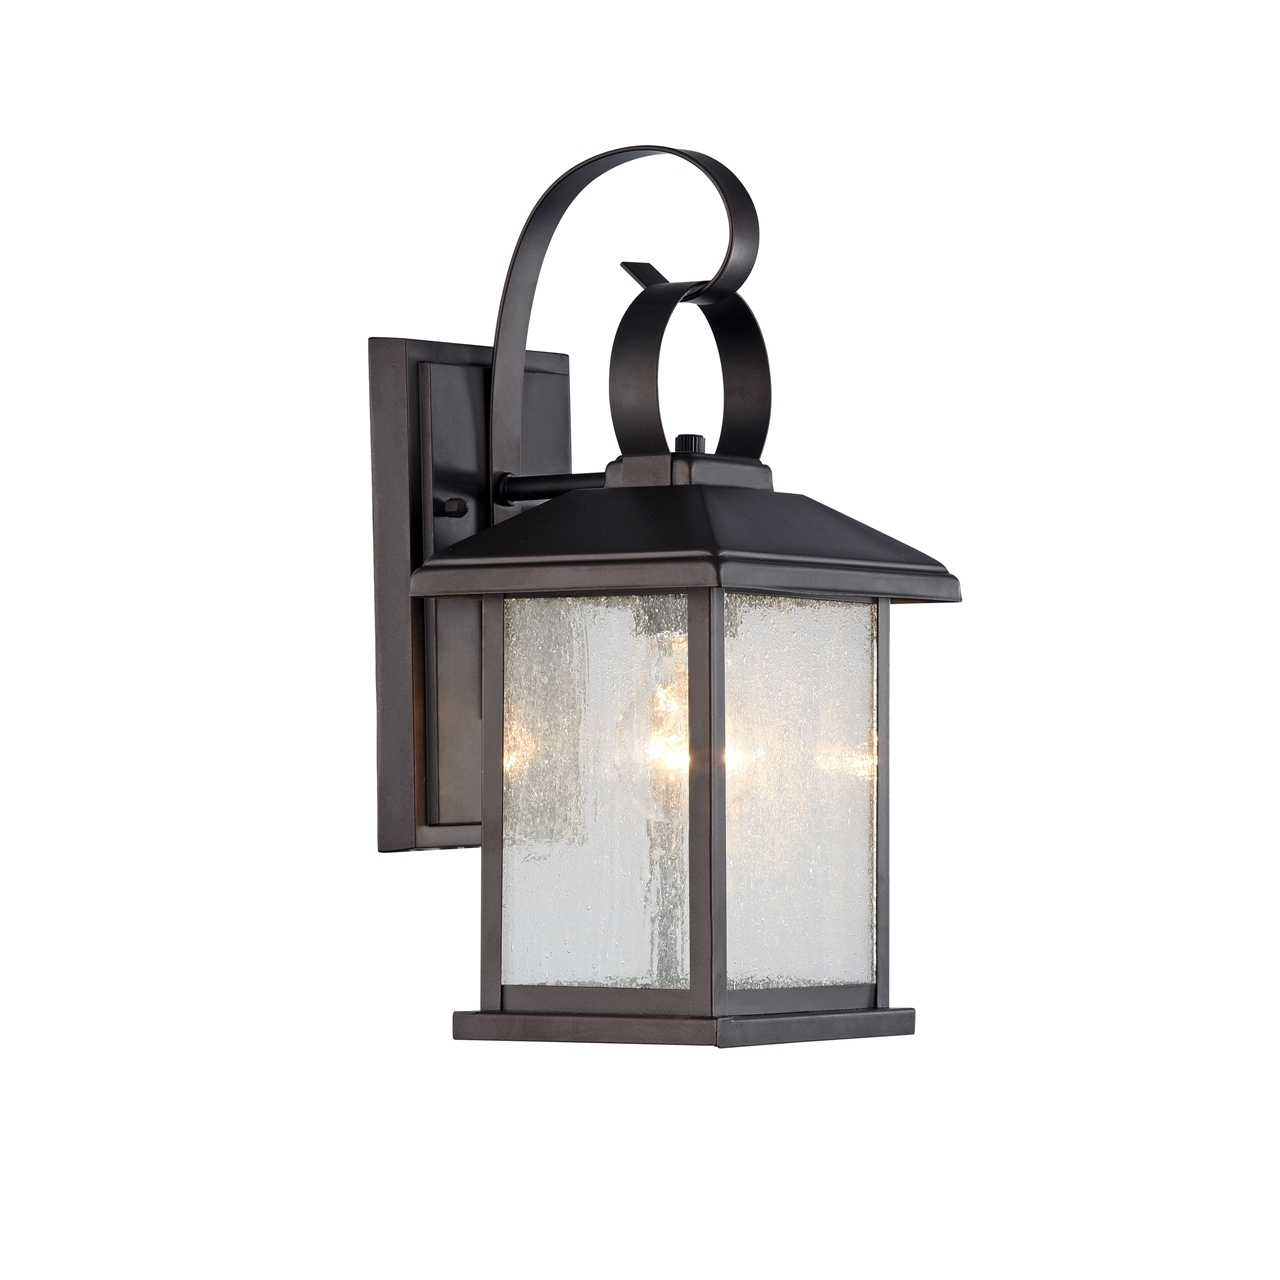 CHLOE Lighting Inc Lighting Wholesale Lighting